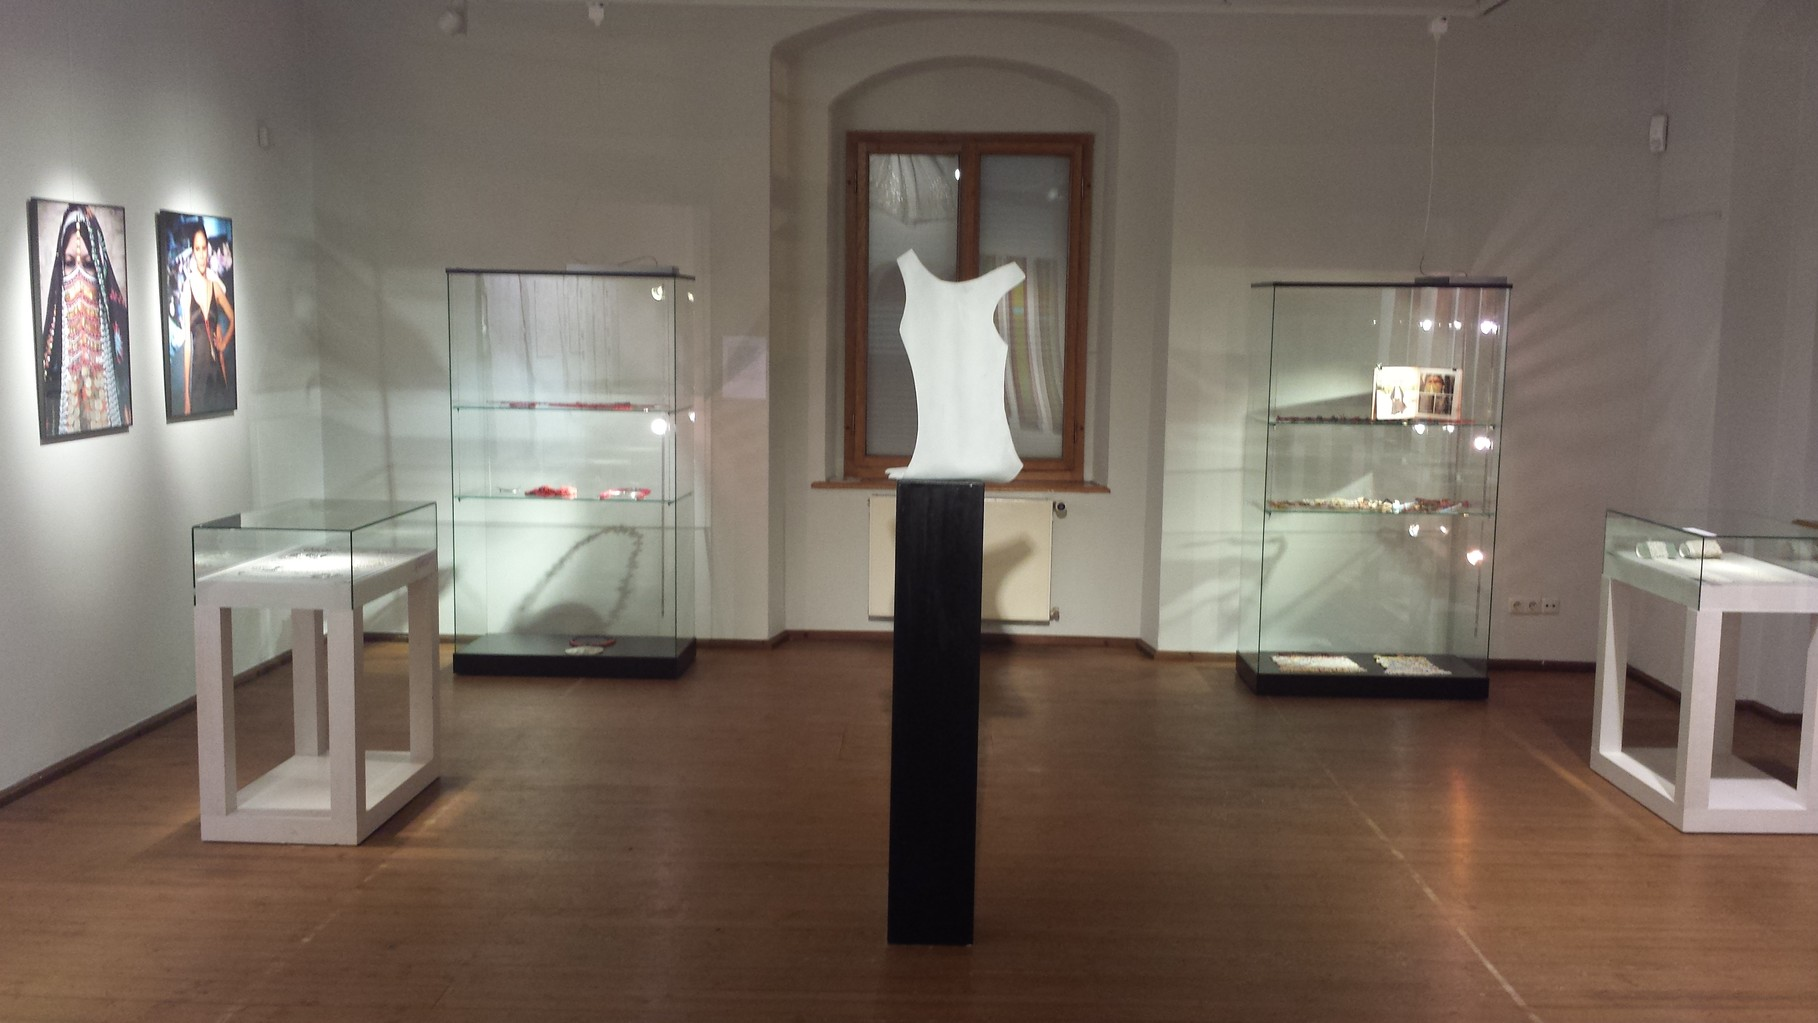 "Wasserschloss Kaffenbach ""Symbol des Lebens"" Ausstellung mit Art Leben im Holz bei Chemnitz"